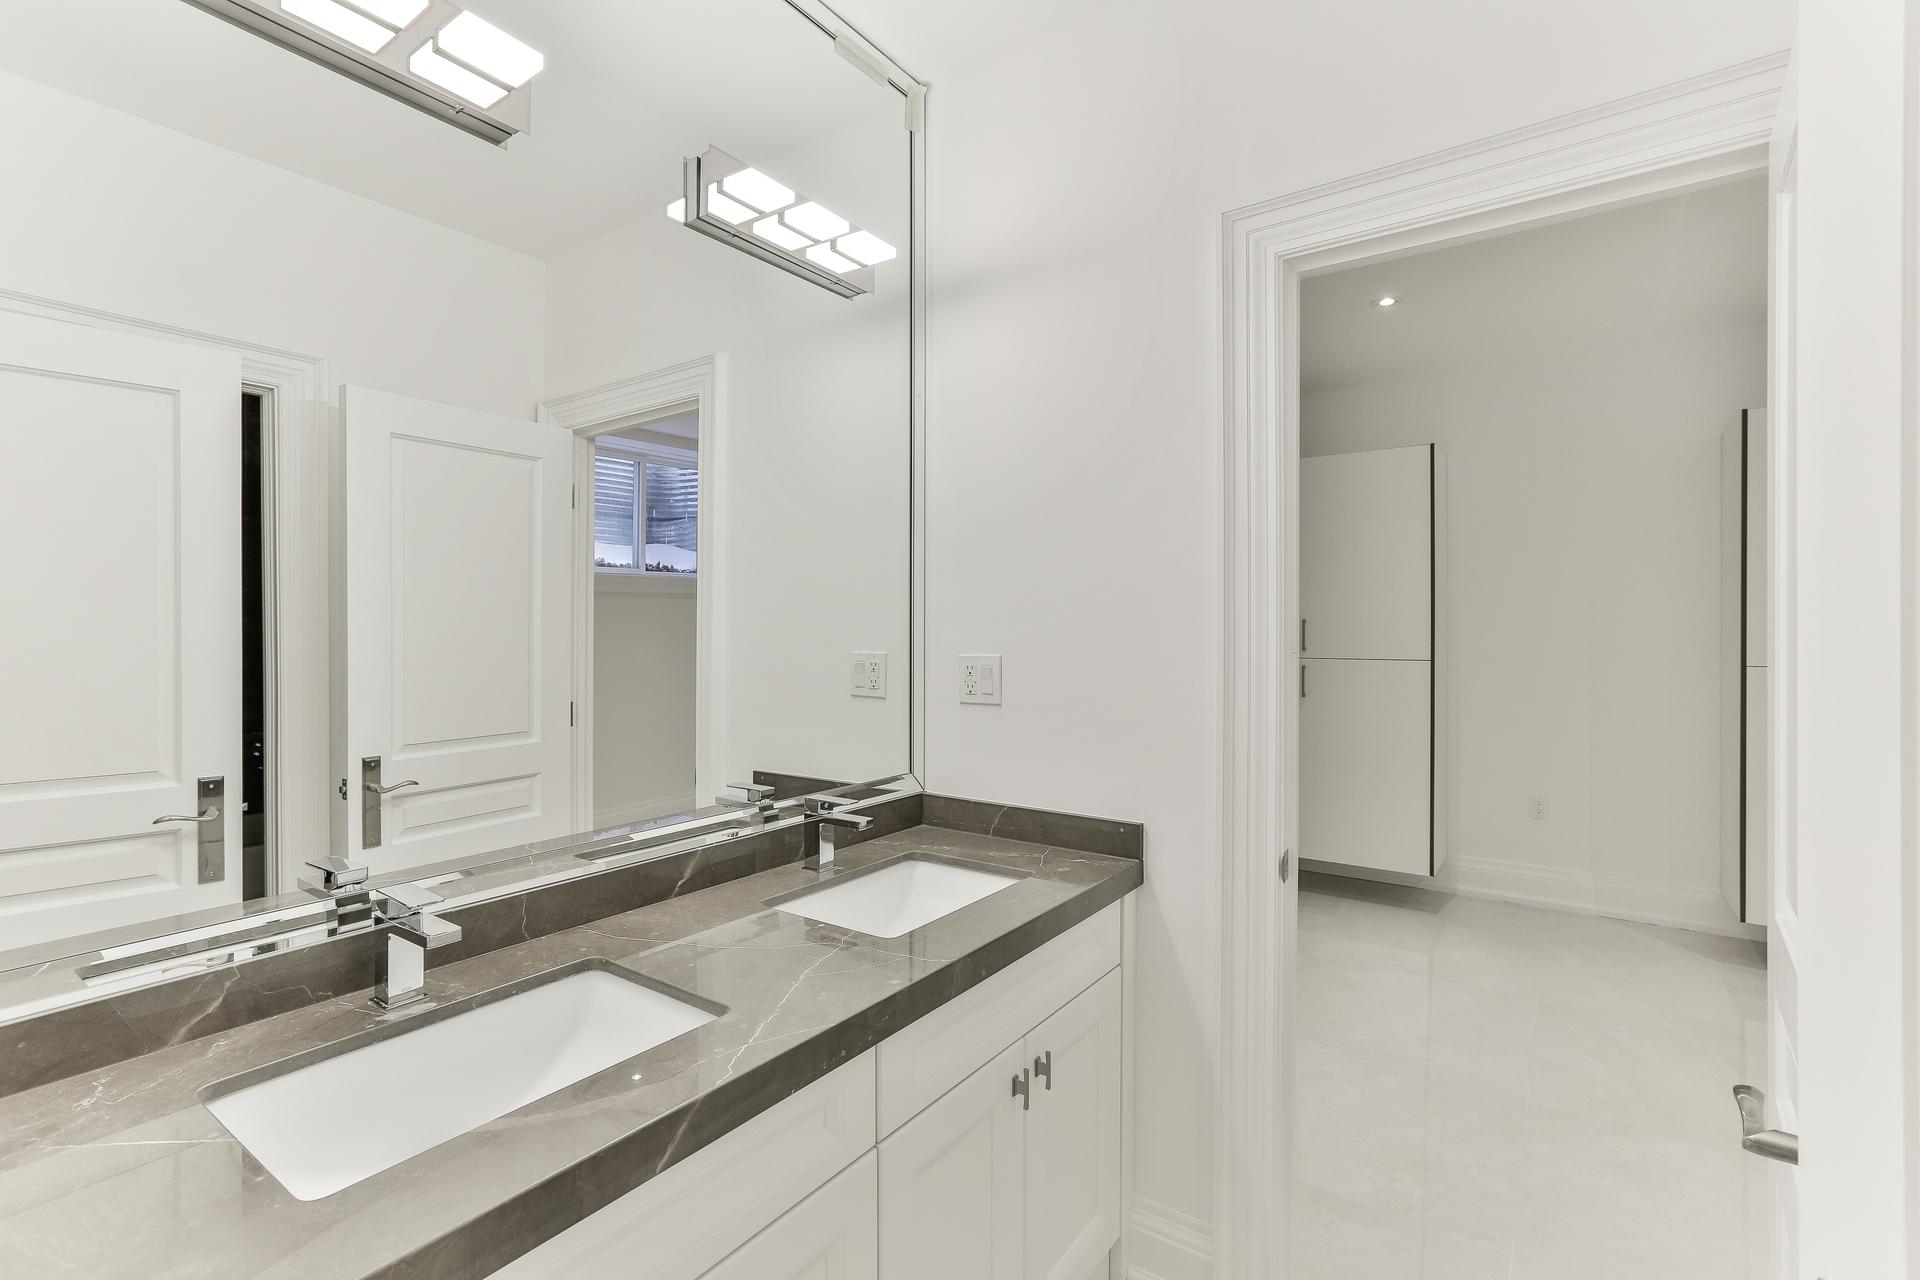 5 Piece Semi-Ensuite Bathroom at 36 Laurentide Drive, Parkwoods-Donalda, Toronto